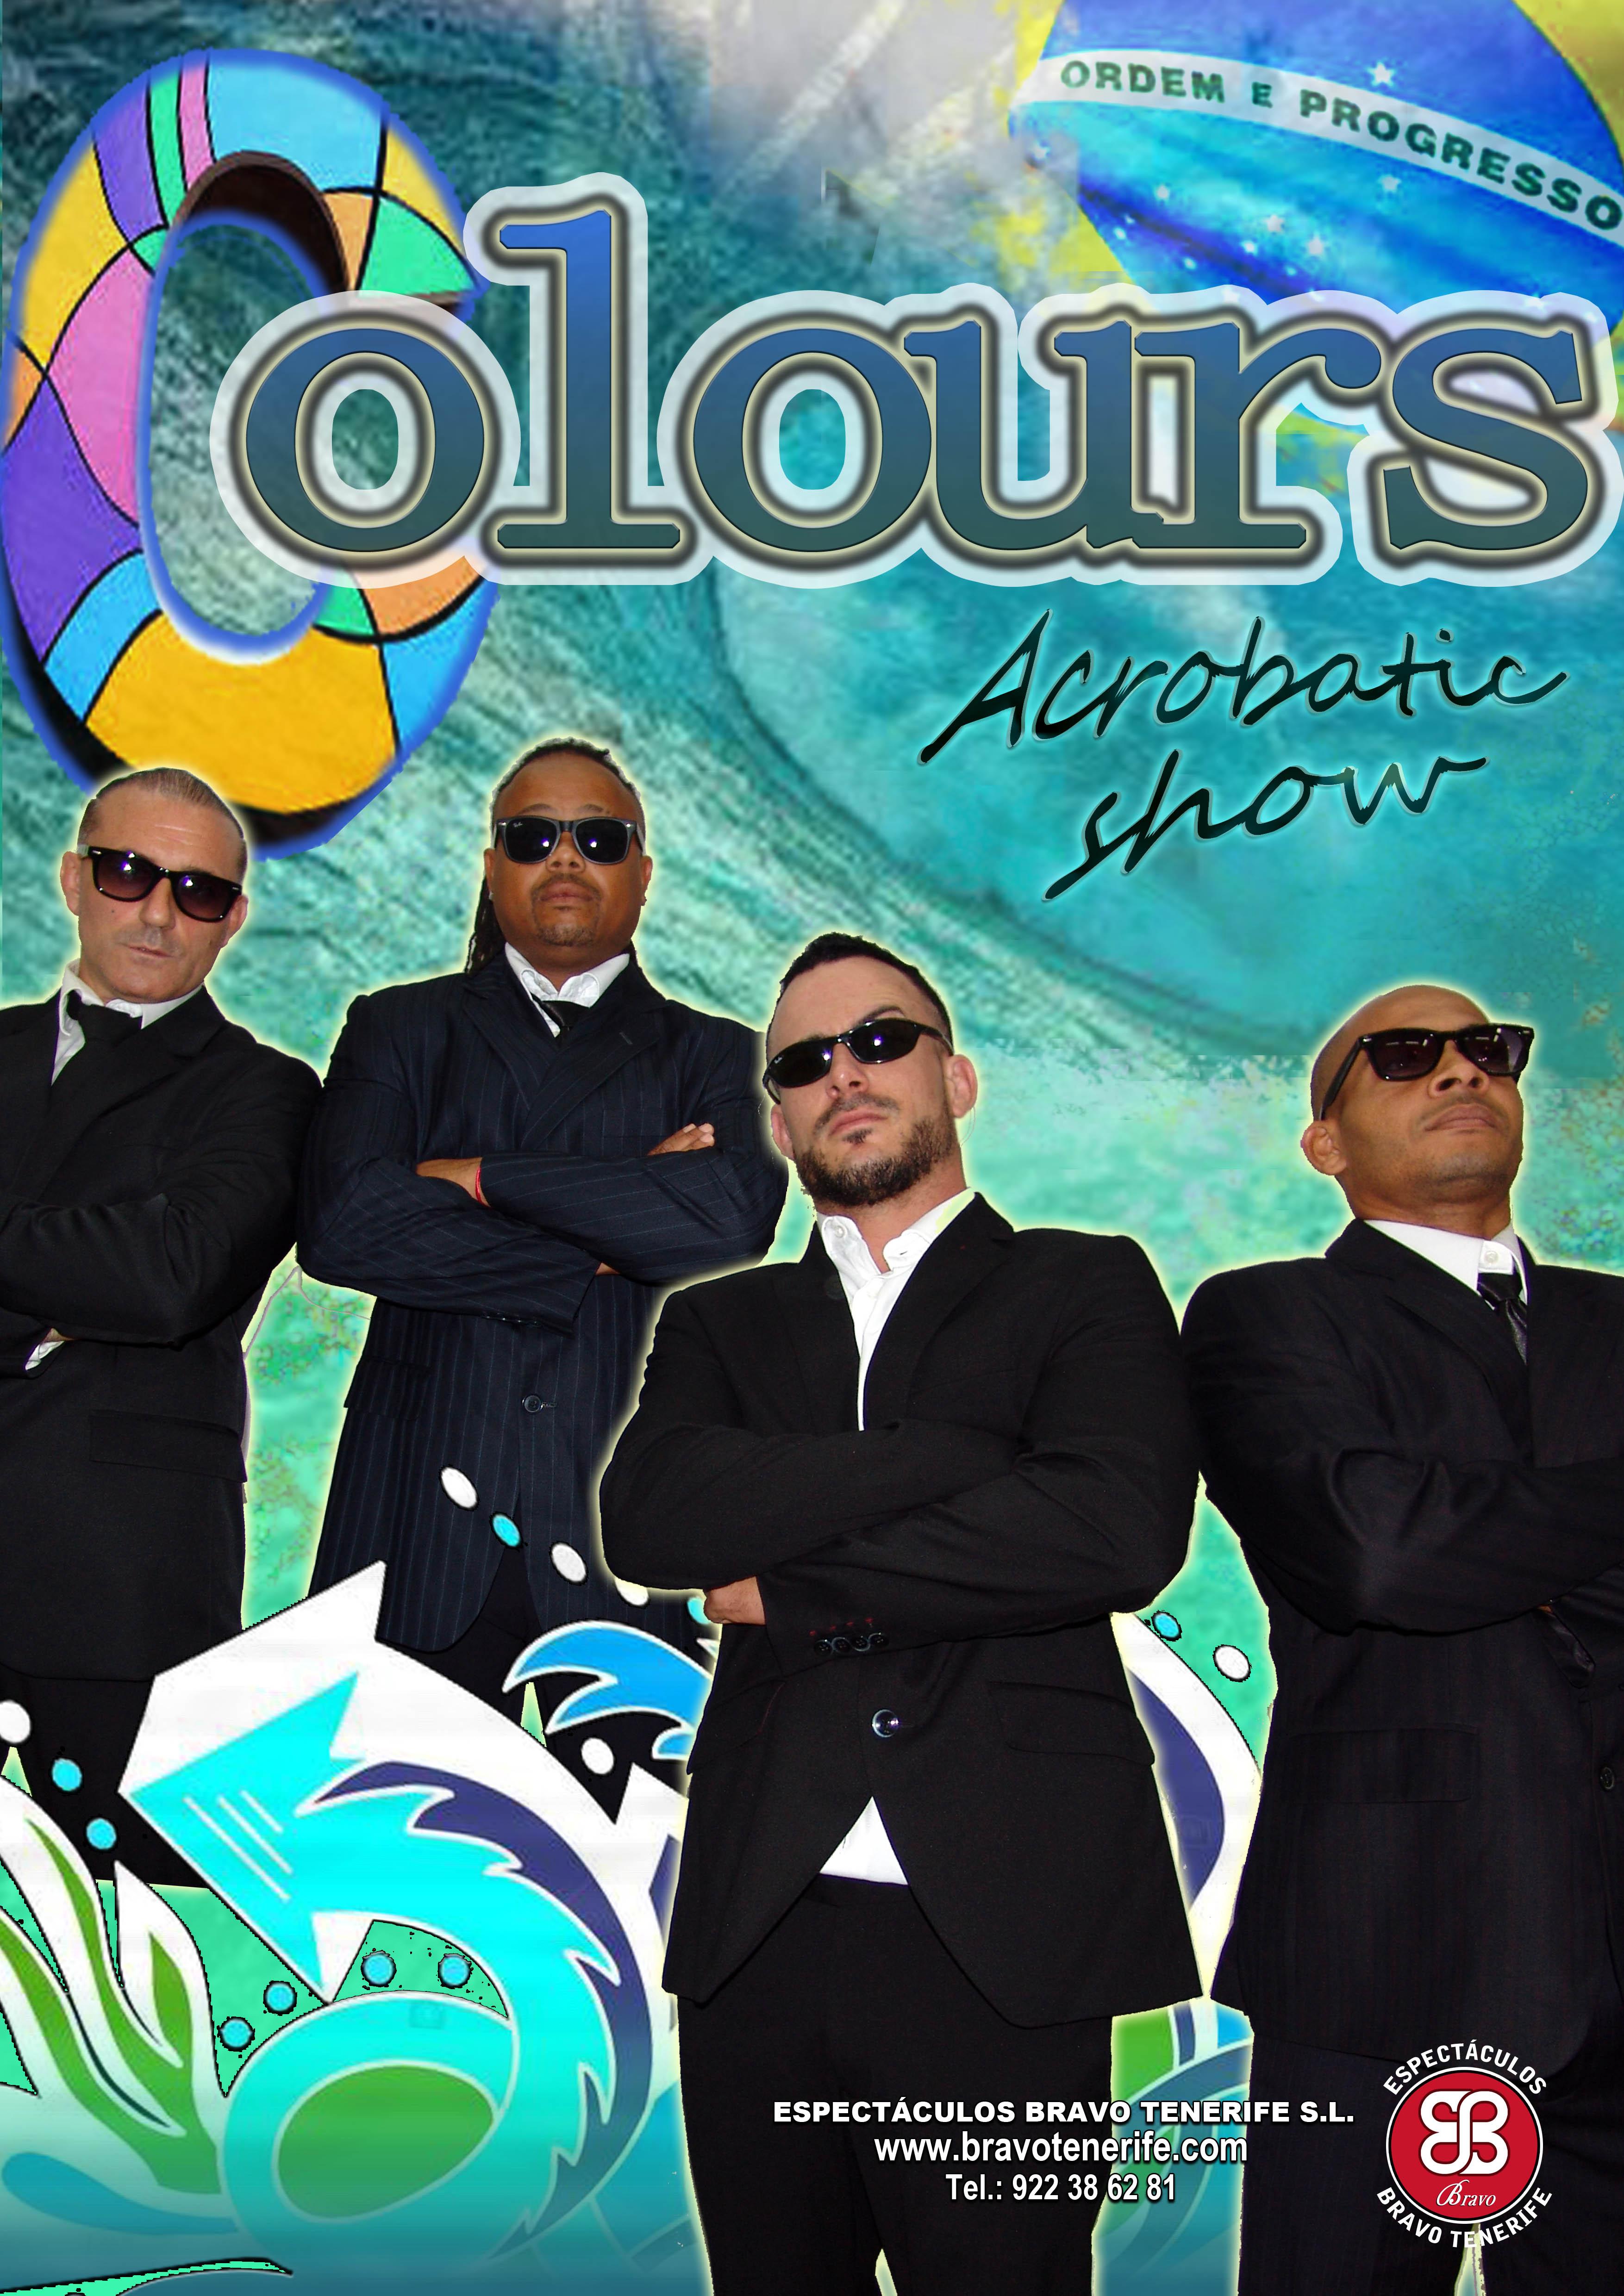 colours-acrobatic-show-bravo